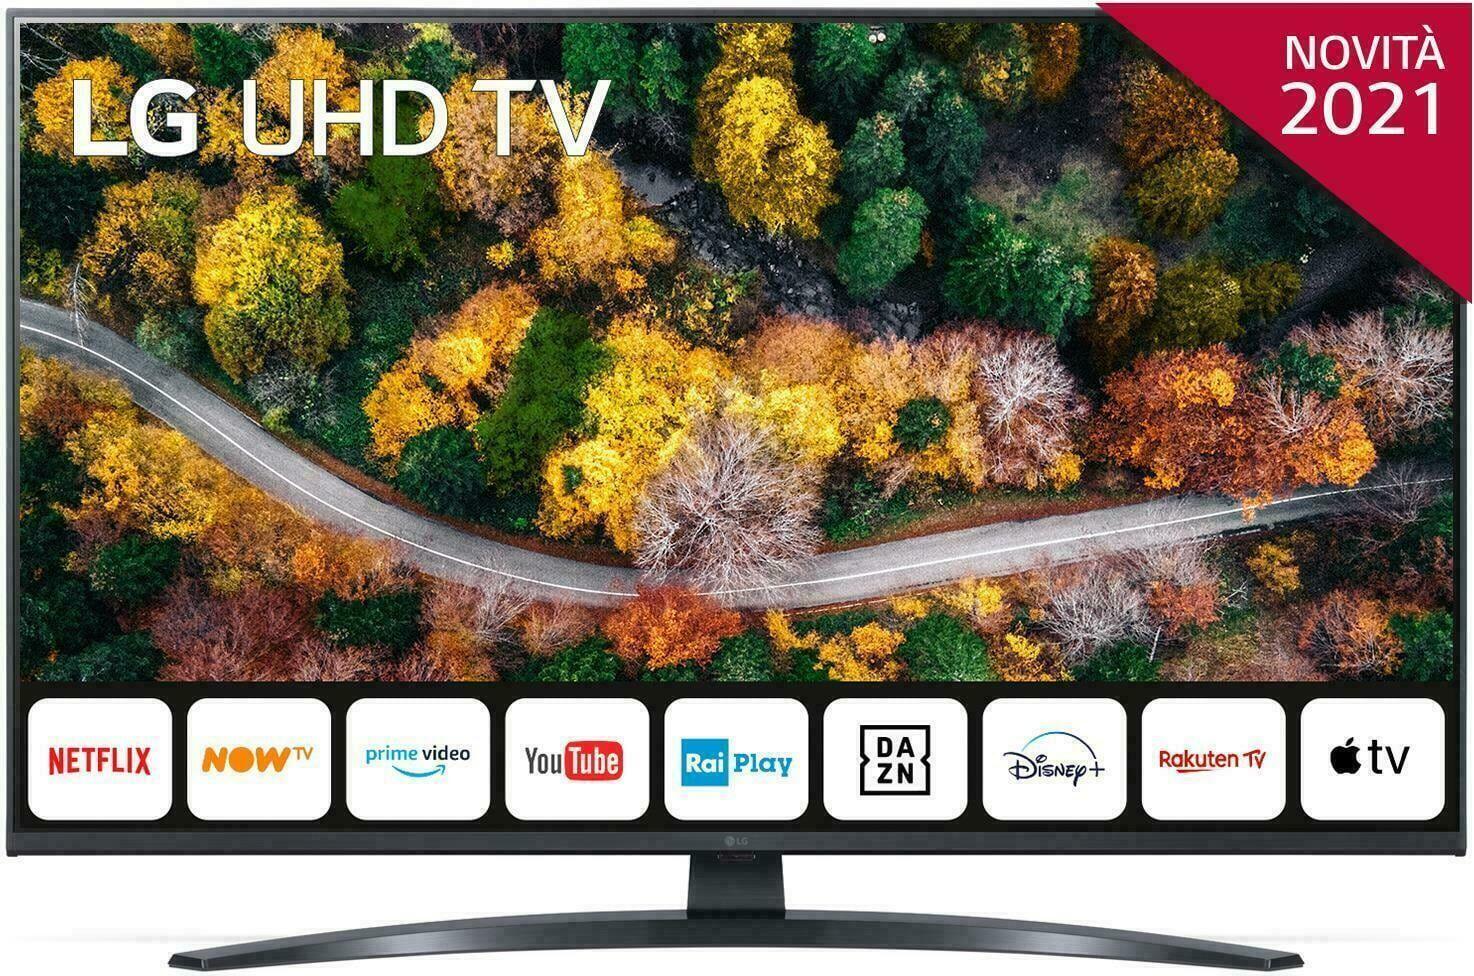 LG 43up78003 Smart Tv 43 Pollici 4k Ultra Hd Televisore Led Webos Wifi - 43up78003